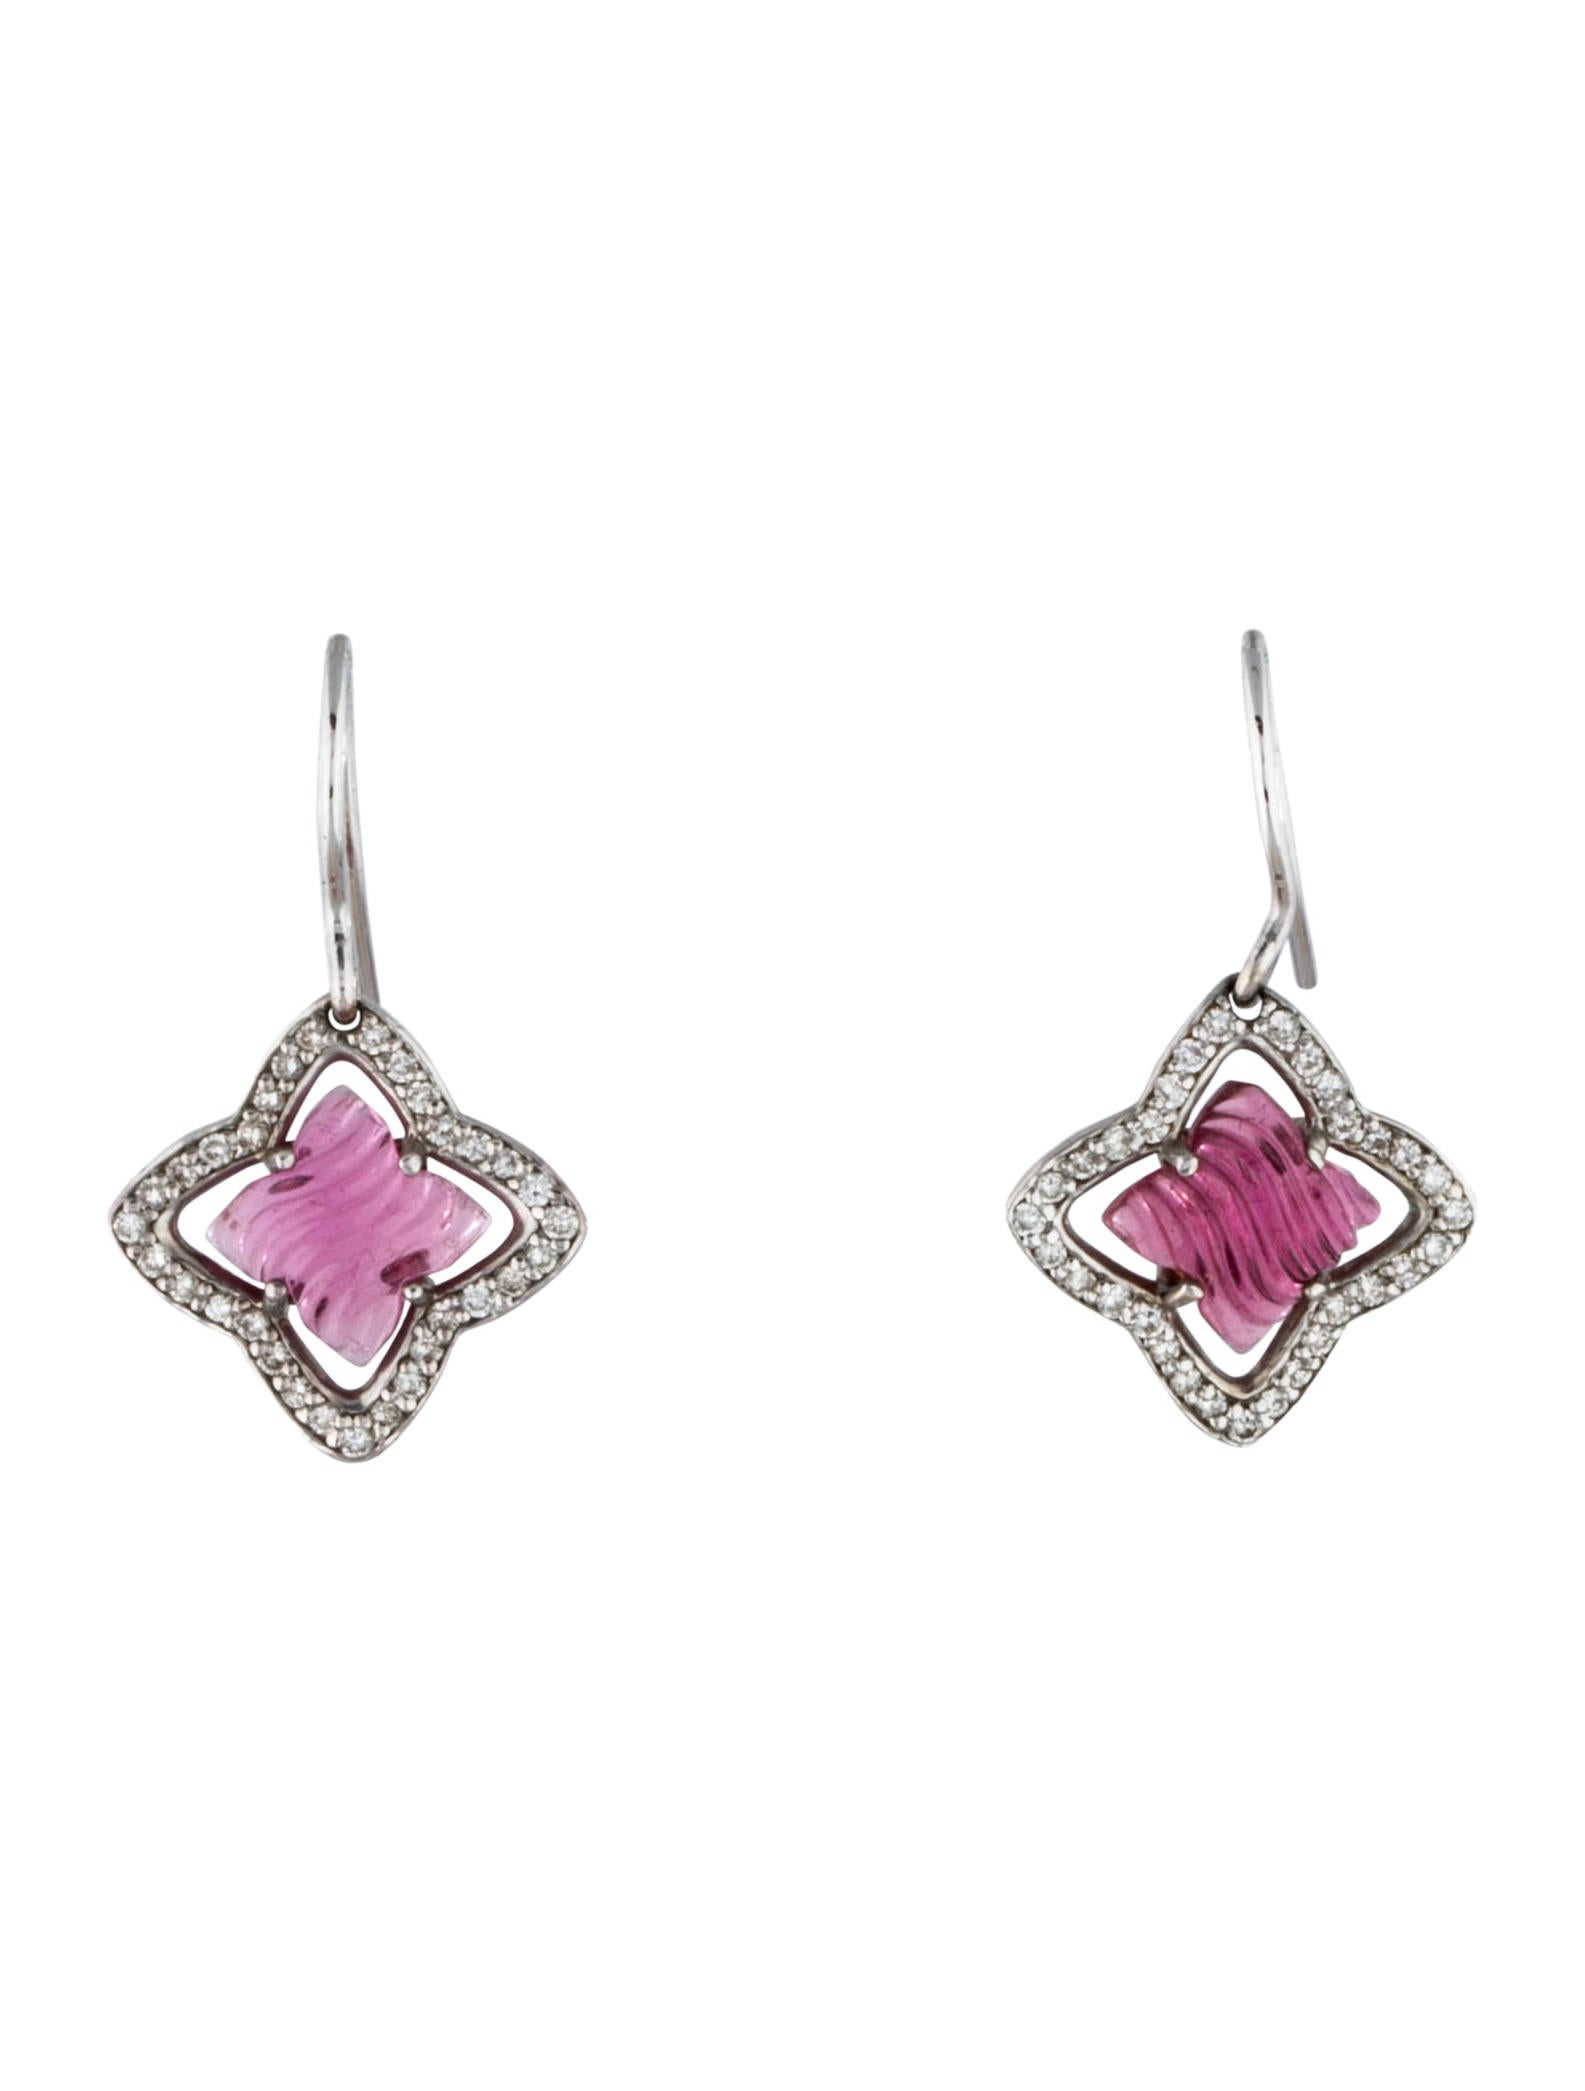 Pink Tourmaline Quatrefoil Earrings